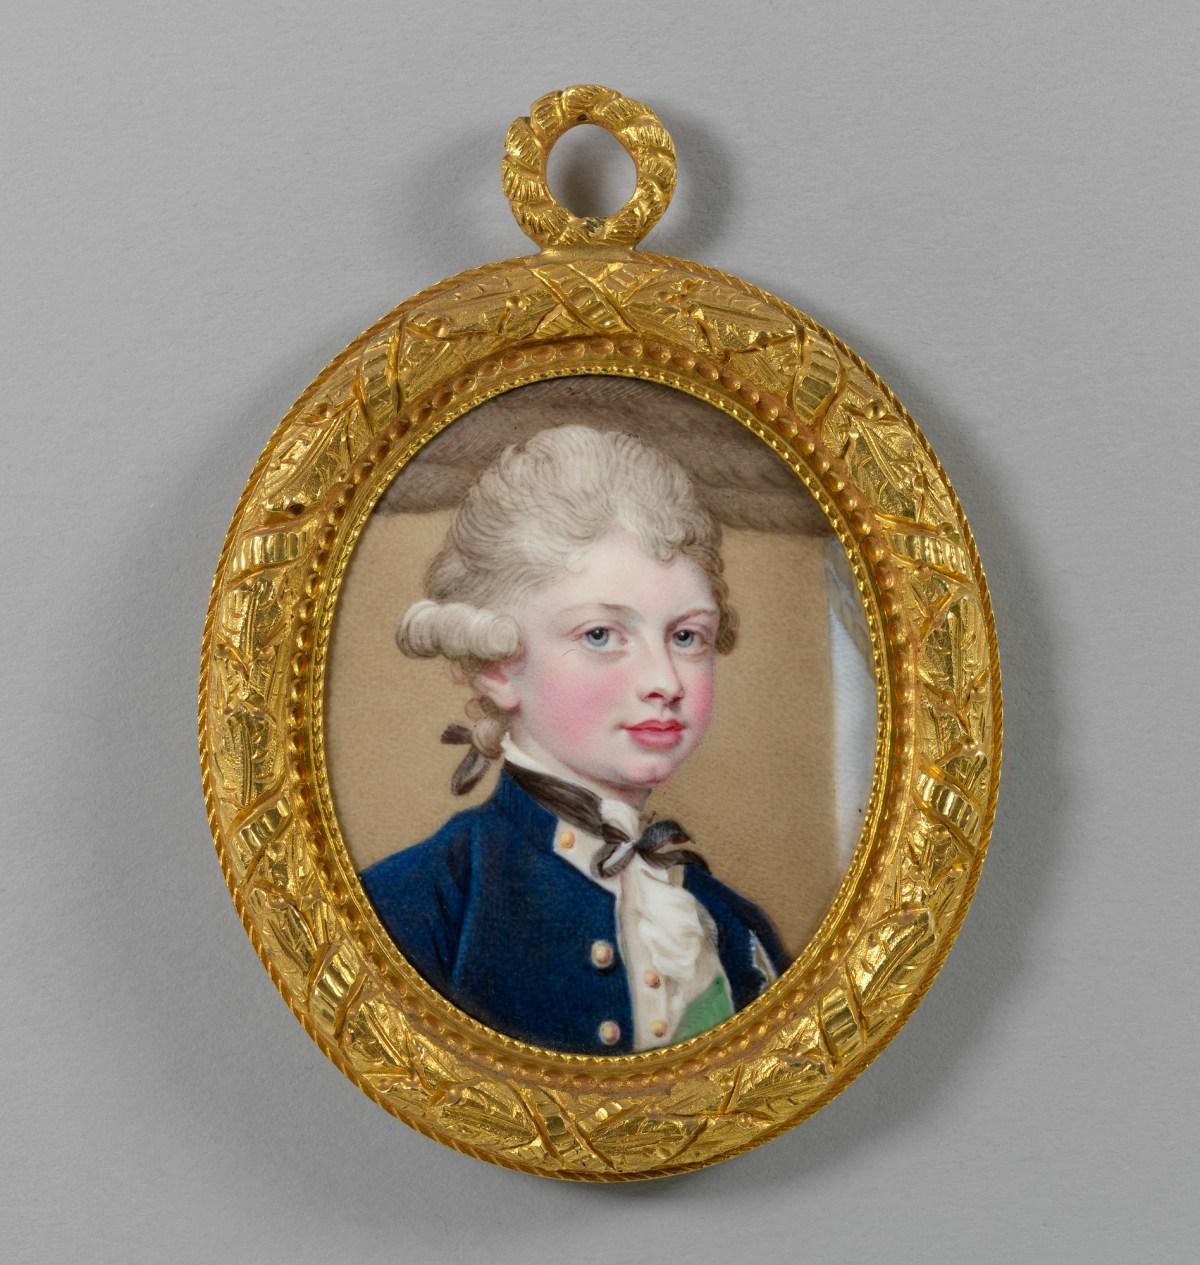 Introducing William IV: A 'sailor king'?